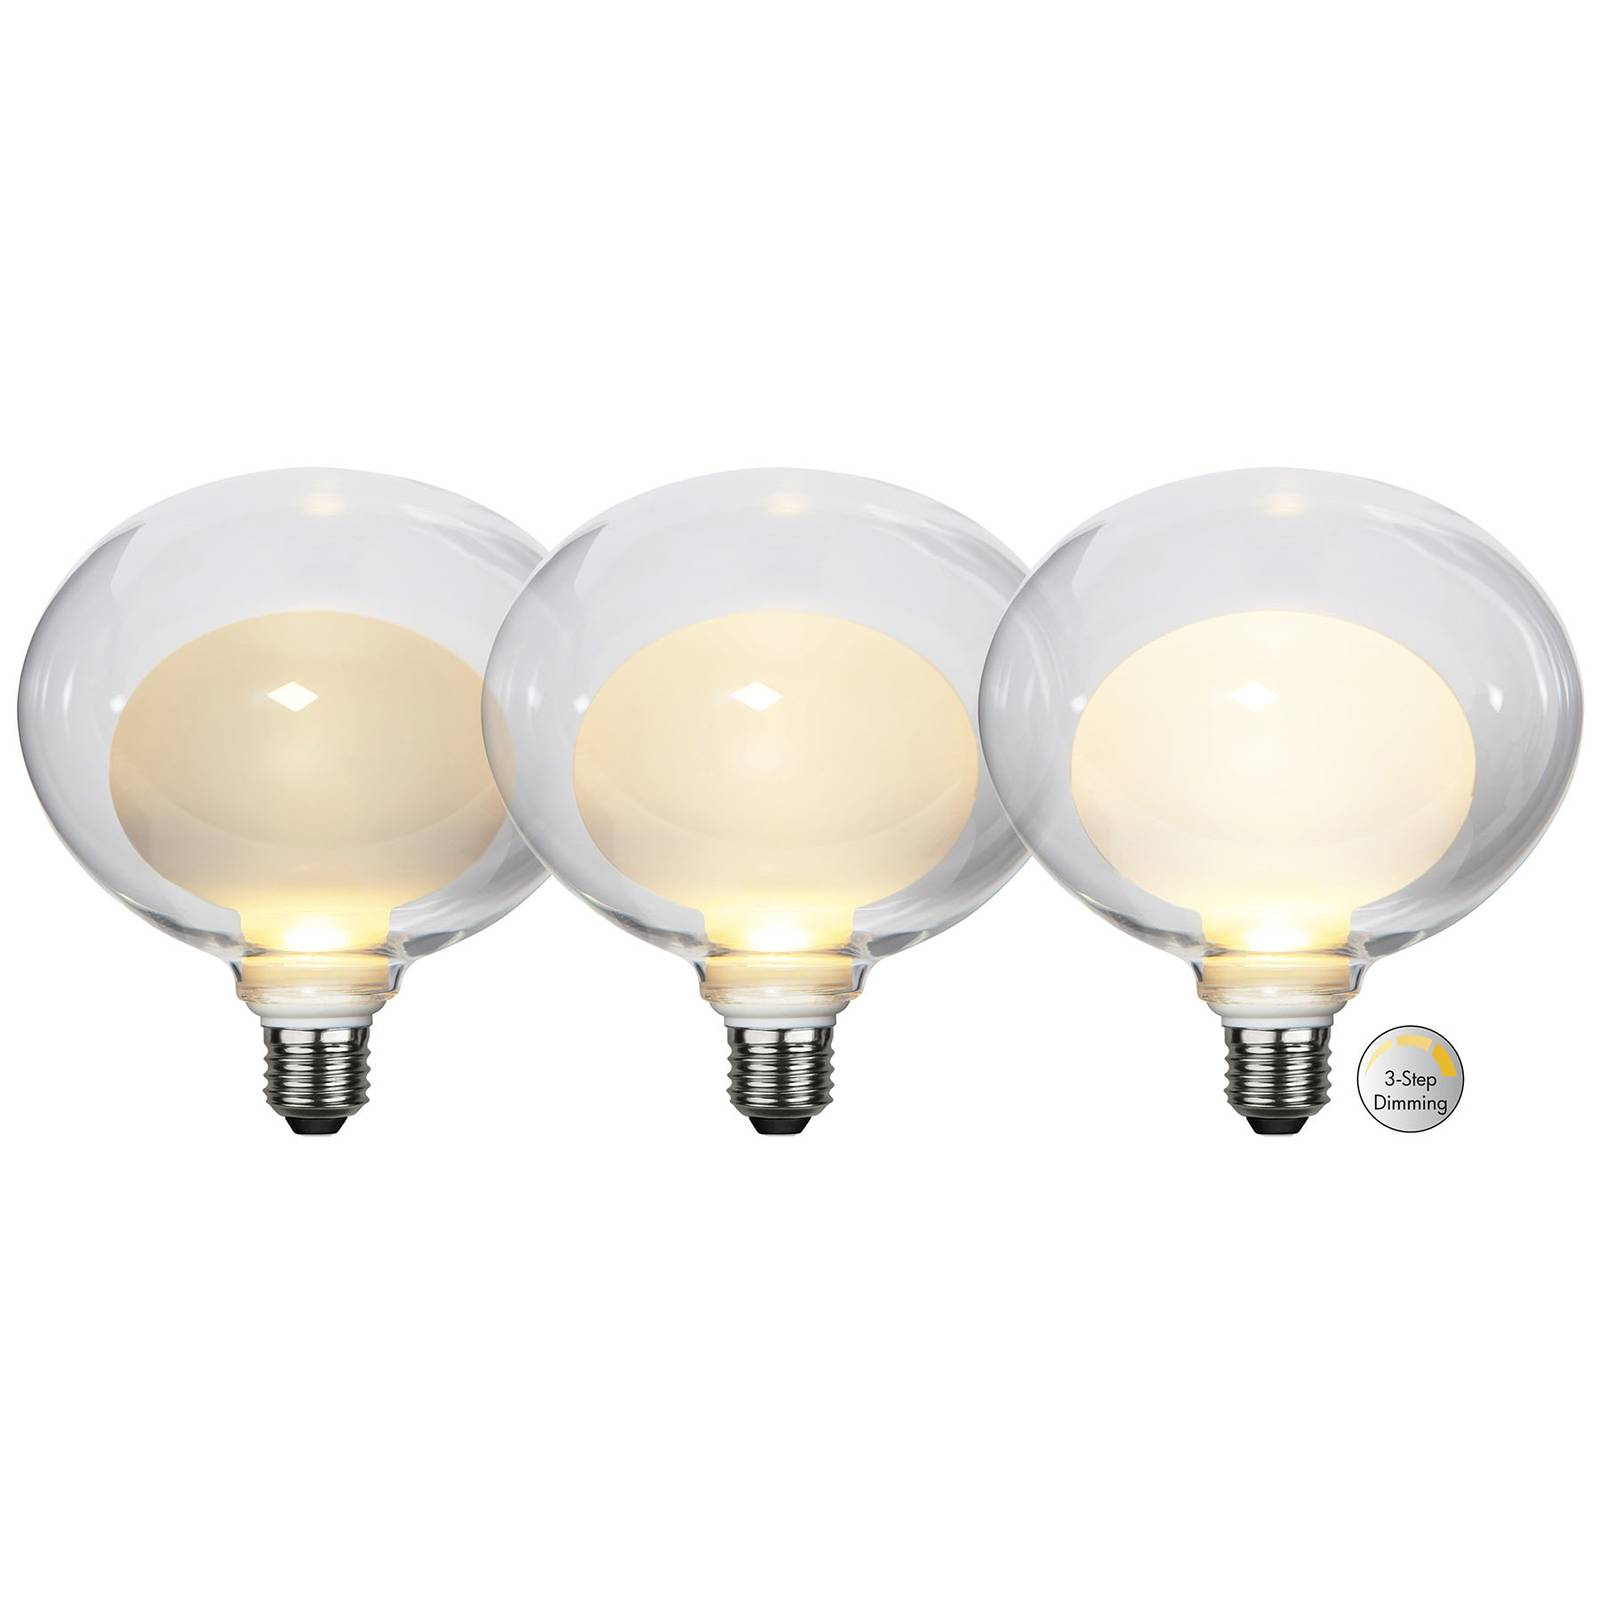 LED-lamppu Space E27 3,5W G150, opaali, 3-step dim